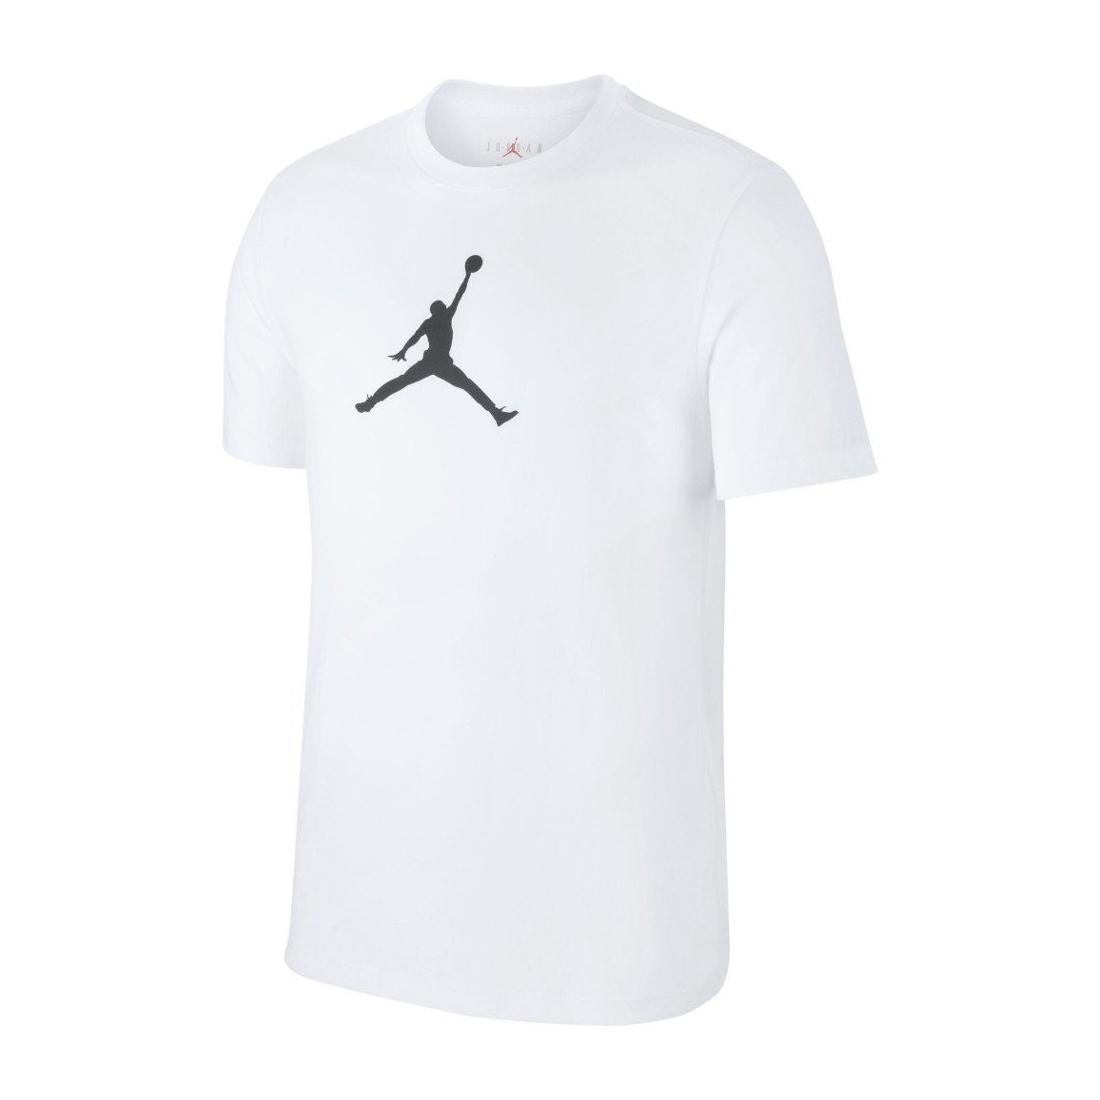 f5e654466 koszulka Jordan Iconic 23/7 AV1167 100 || timsport.pl - dodatkowe ...